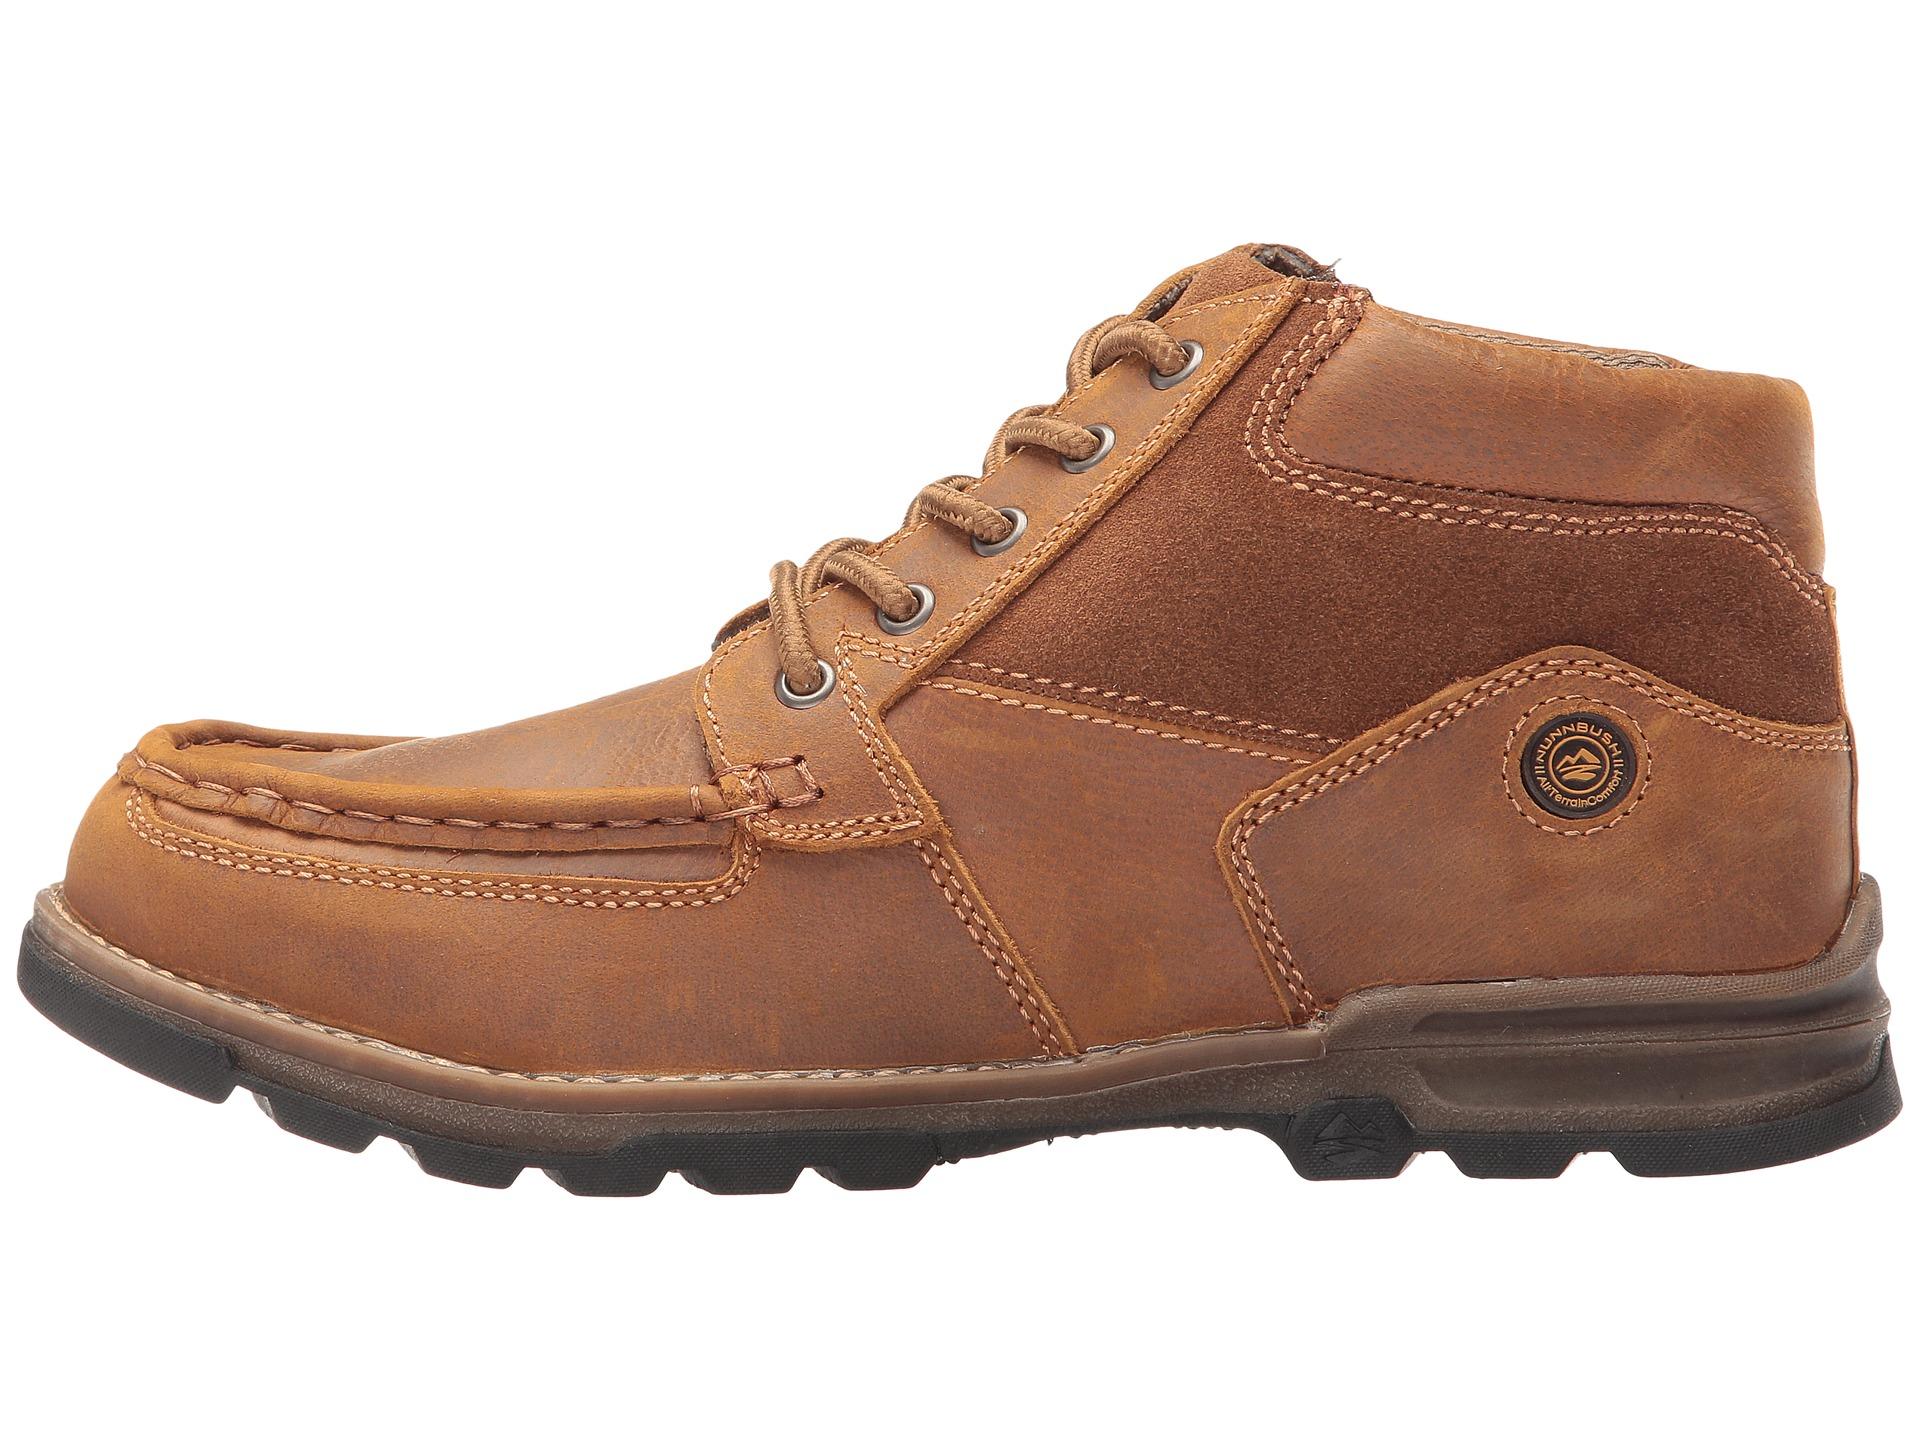 Nunn Bush Pershing Boot All Terrain Comfort At Zappos Com